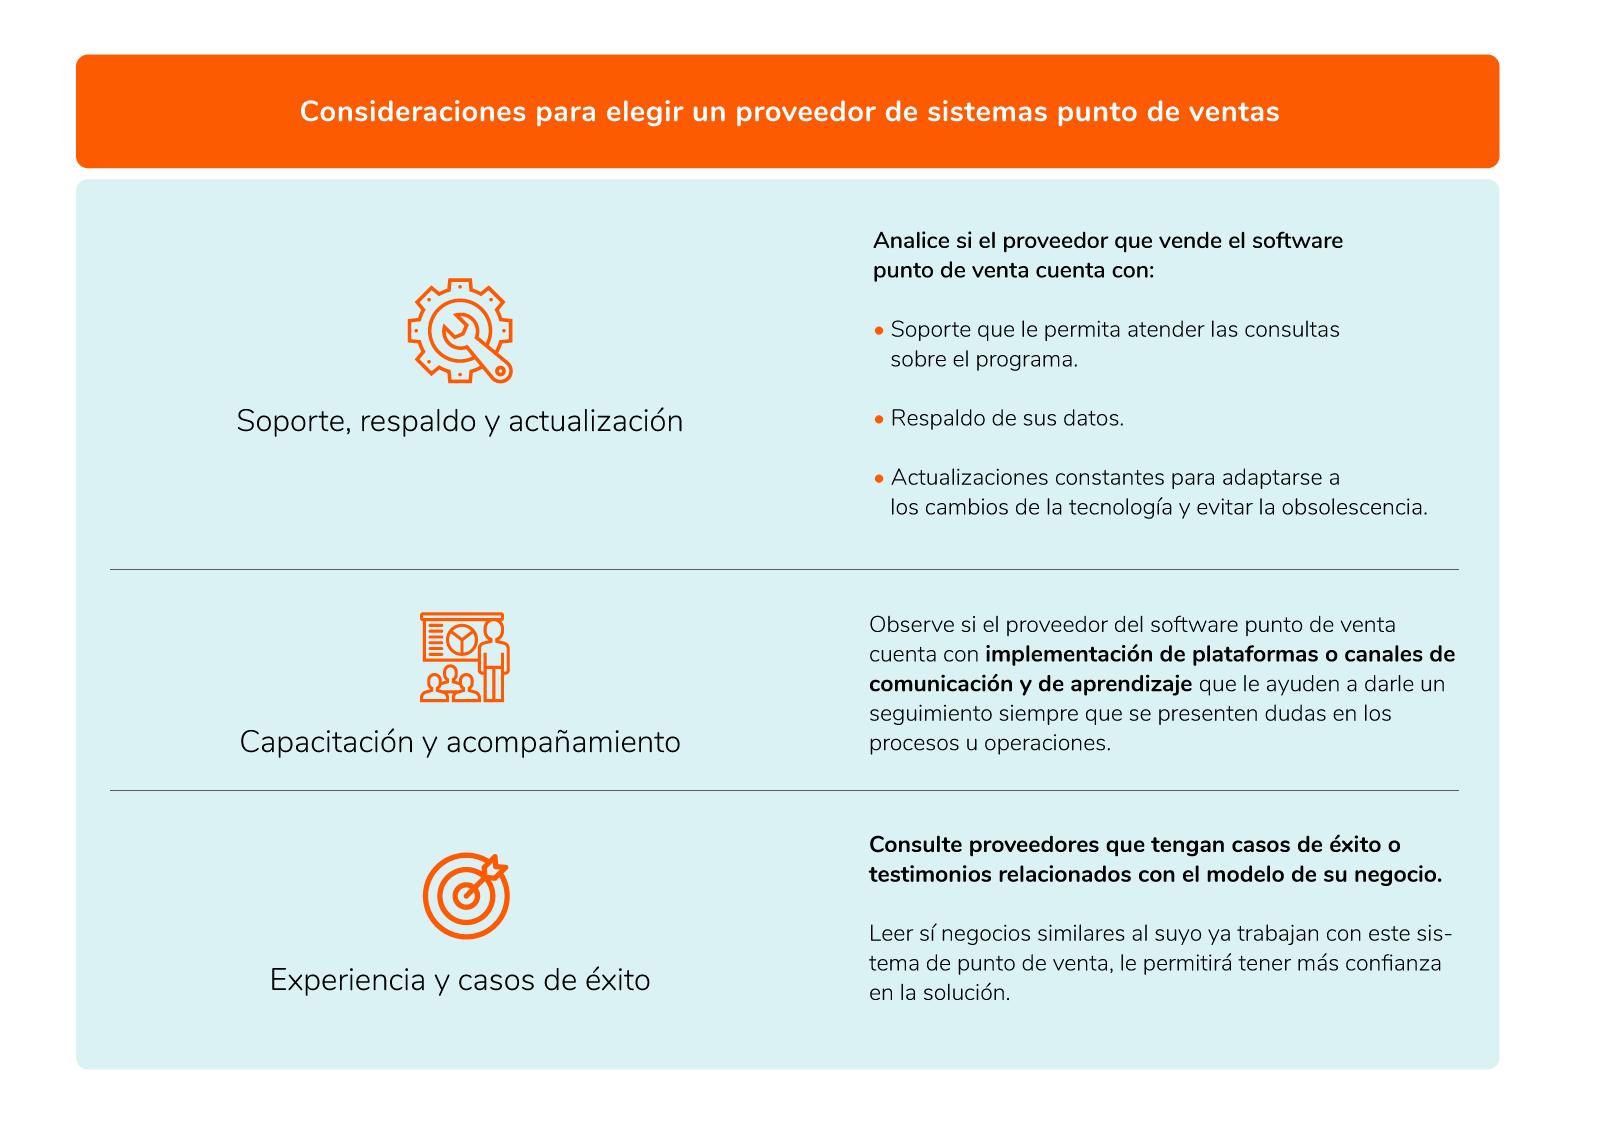 infografia-software-punto-venta-costa-rica